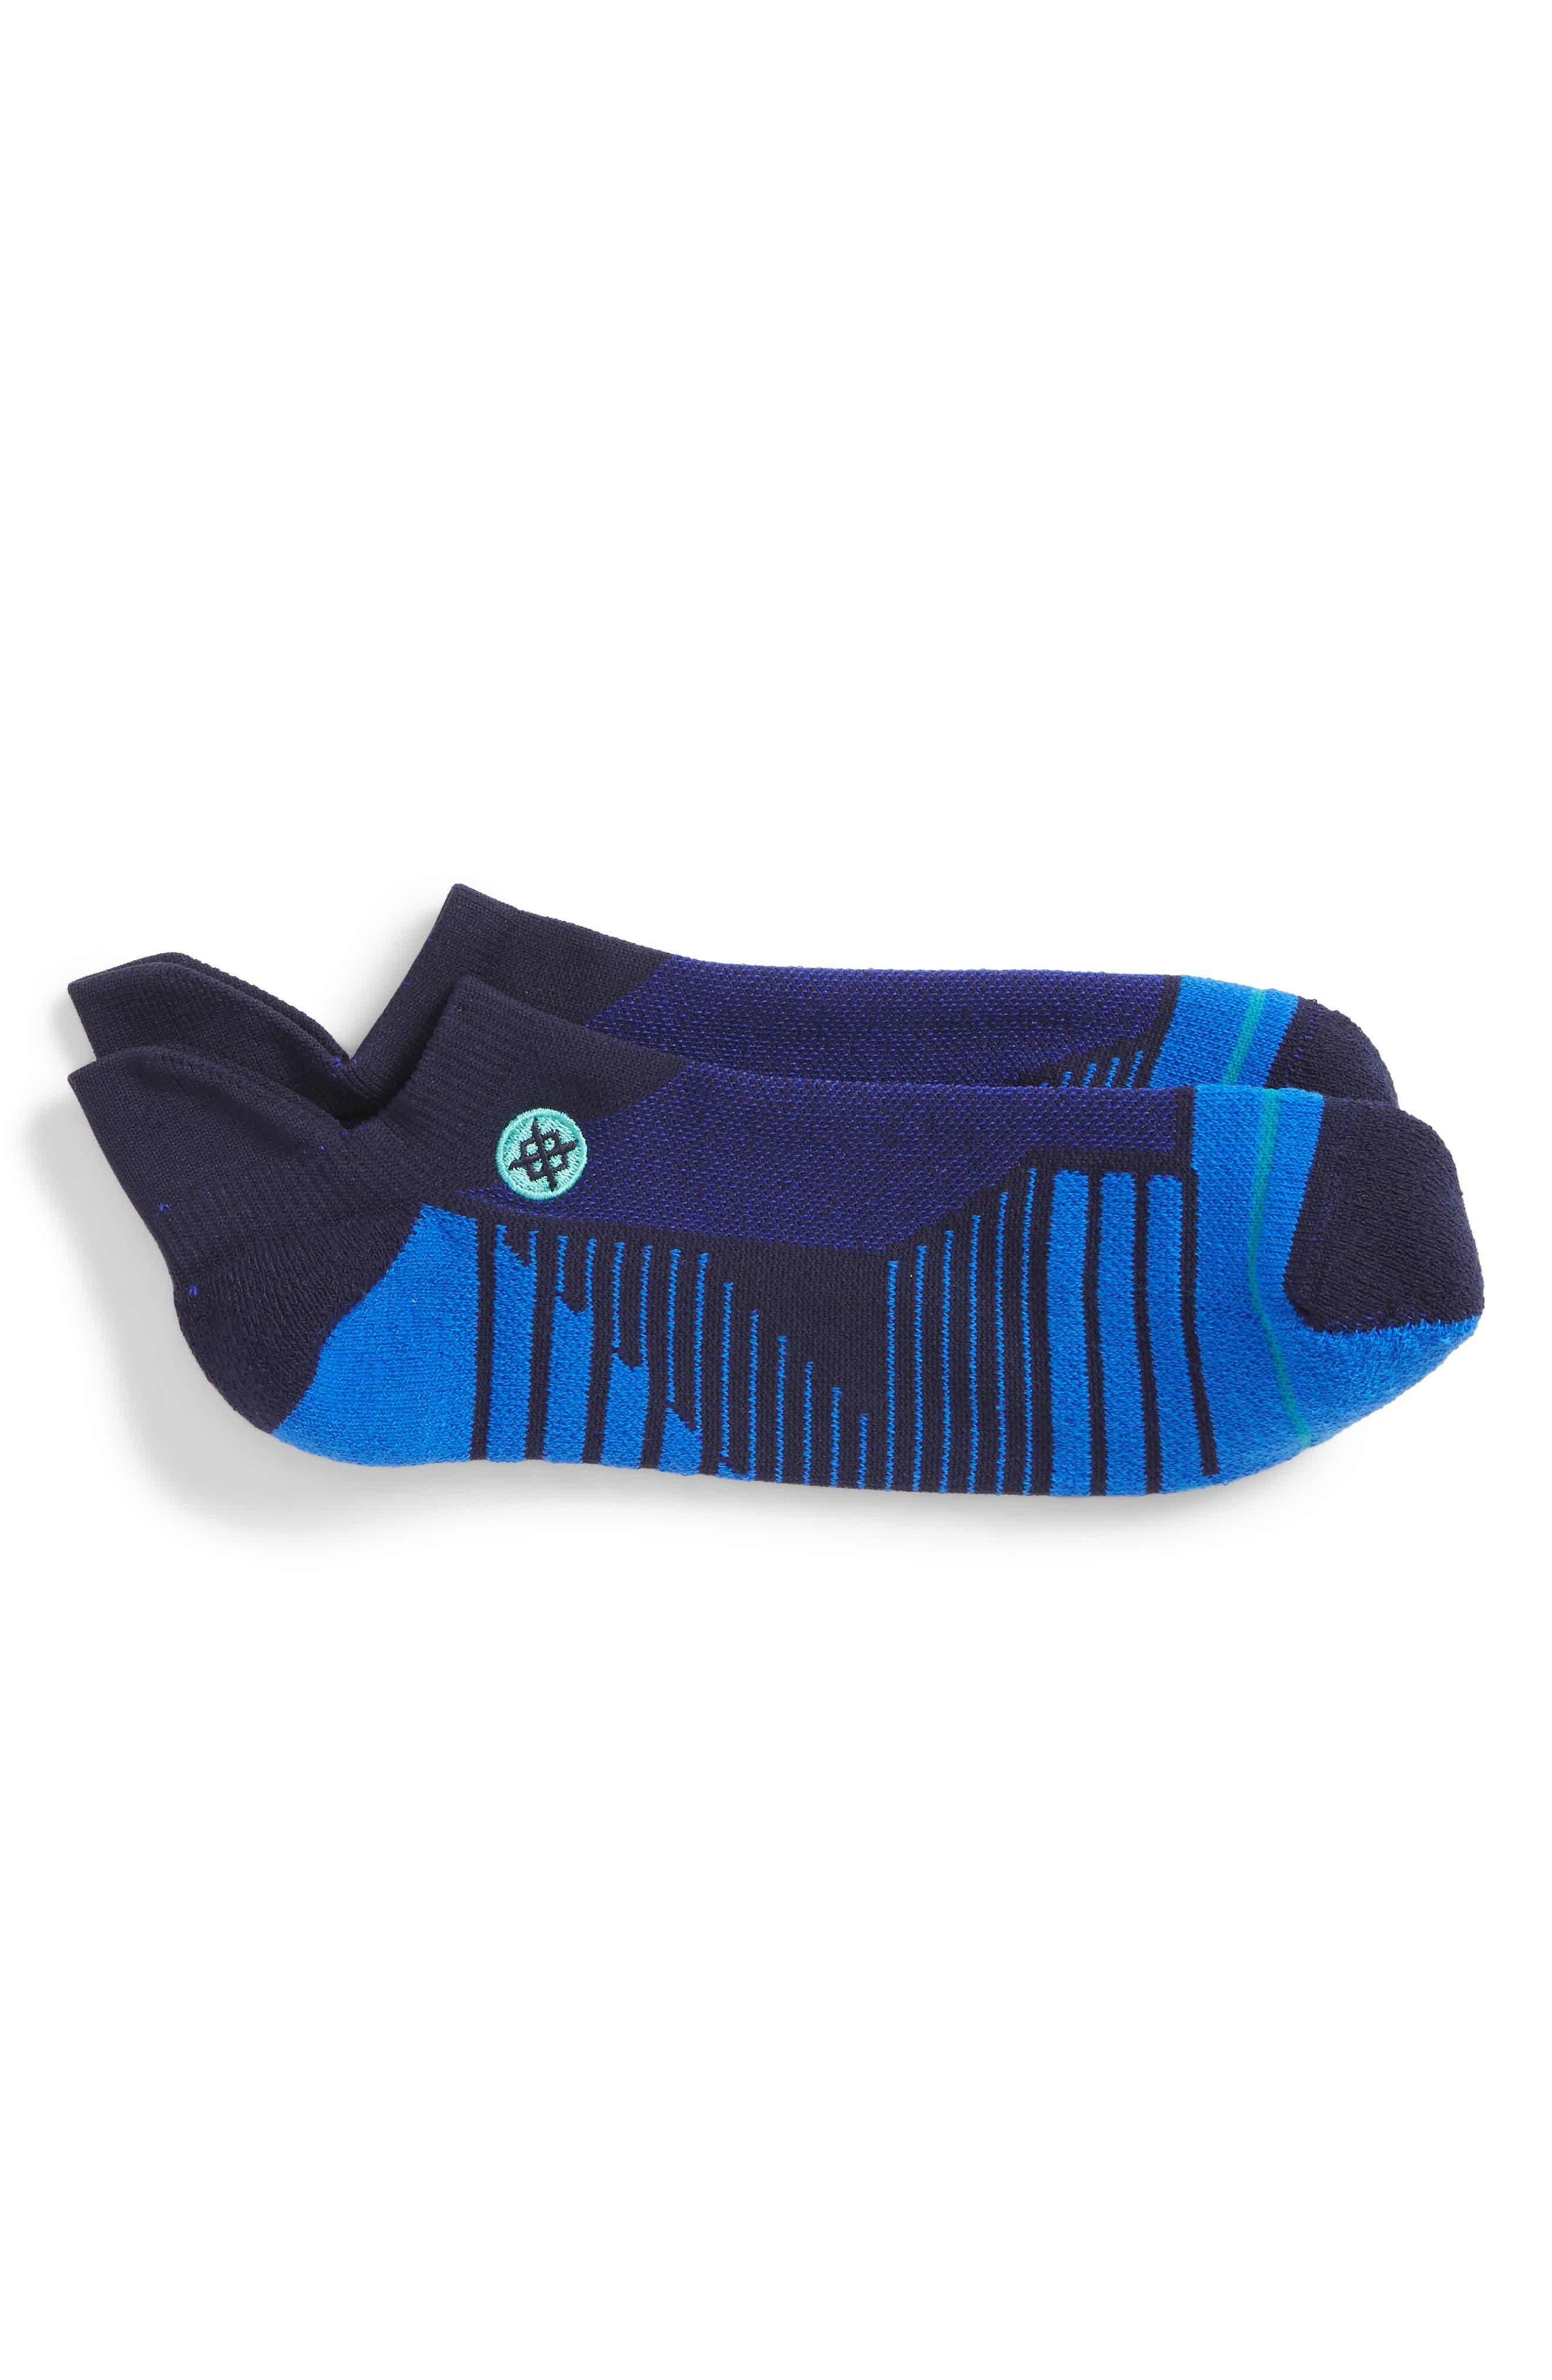 STANCE High Regard Tab Socks, Main, color, 410